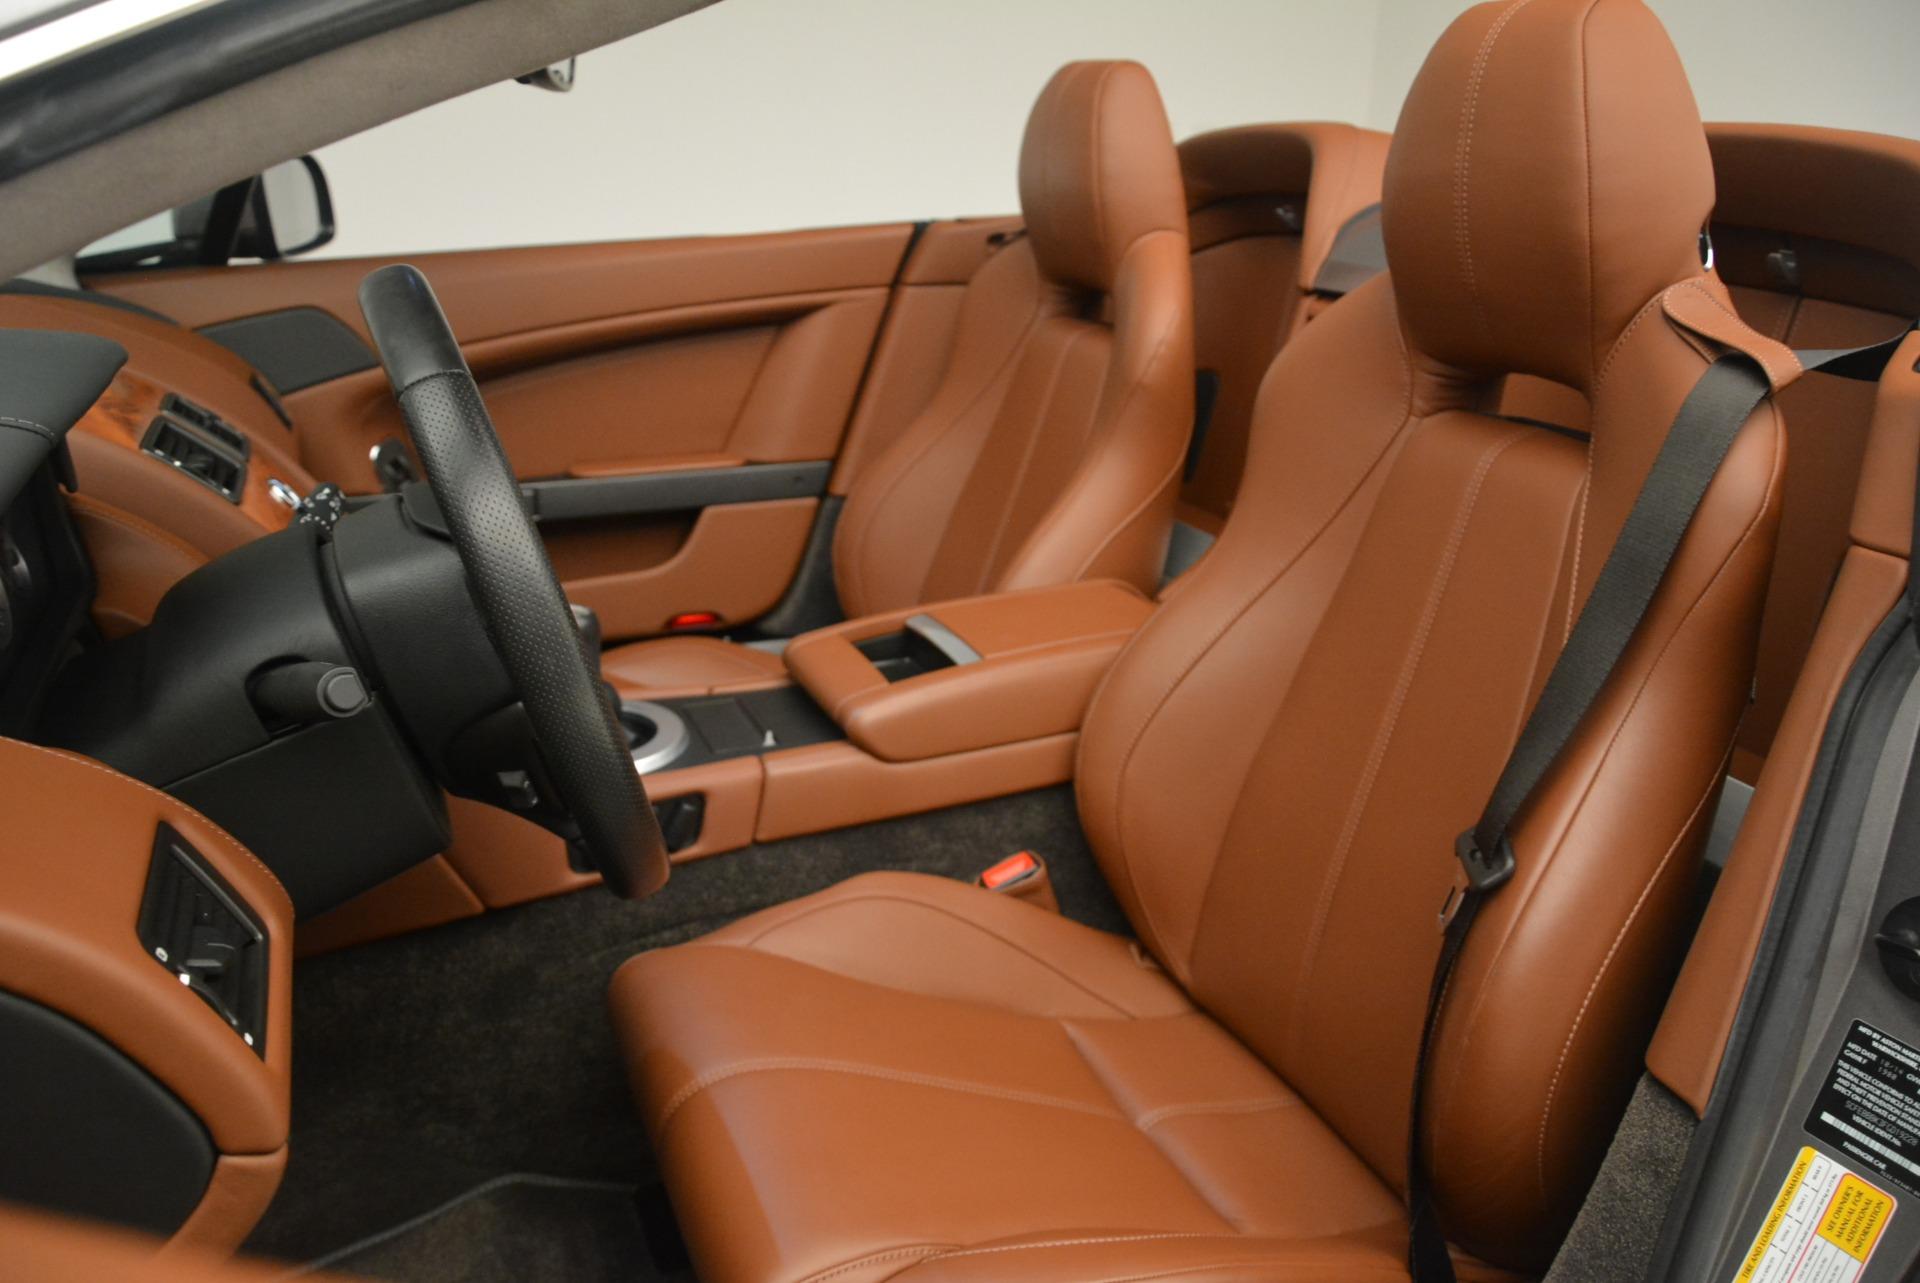 Used 2015 Aston Martin V8 Vantage Roadster For Sale In Greenwich, CT. Alfa Romeo of Greenwich, 7396 2463_p21